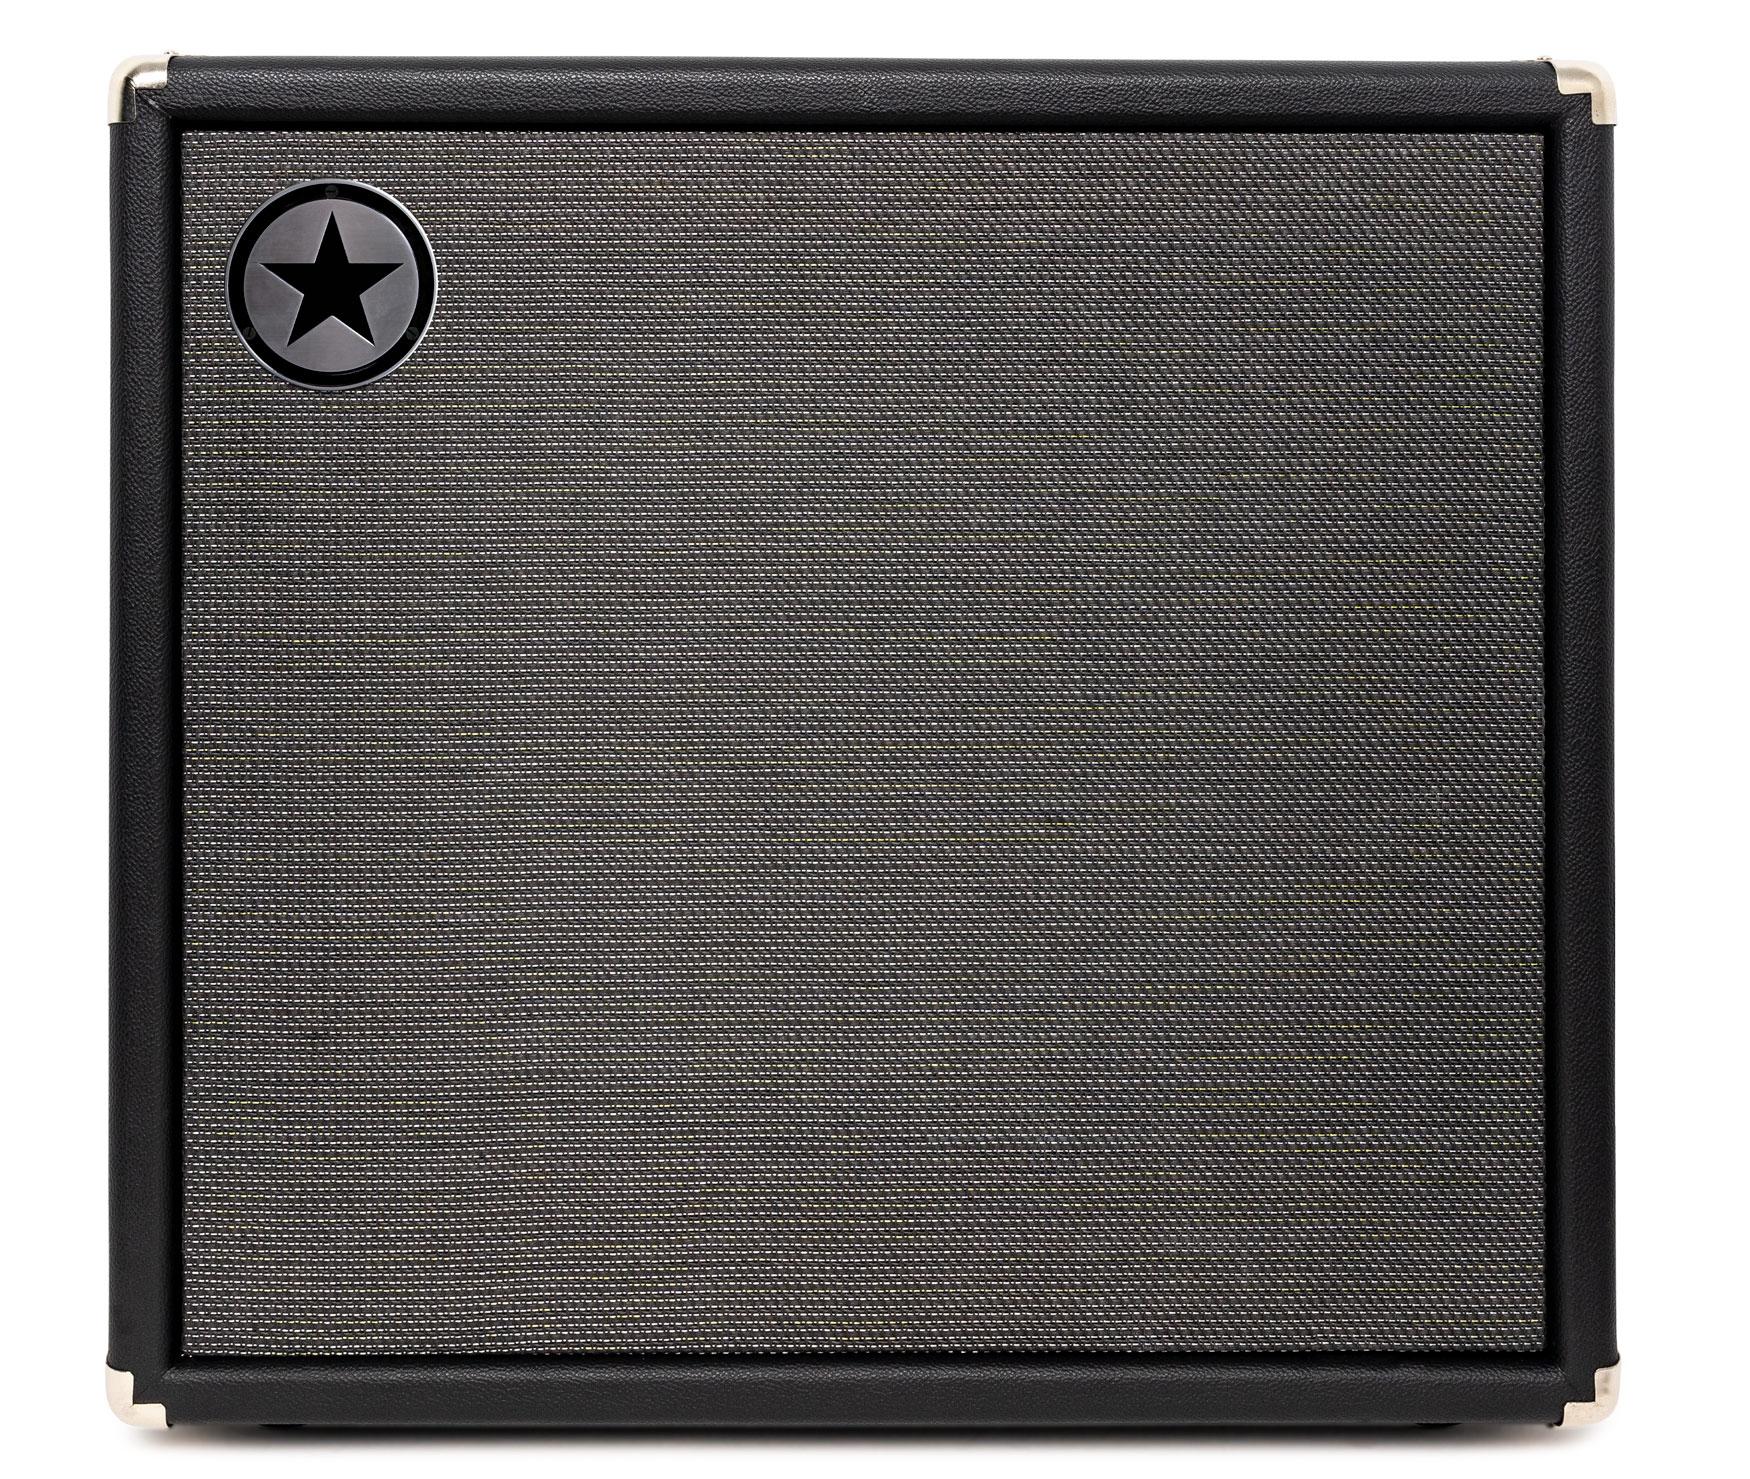 BLACKSTAR-Unity-Bass-1-x-15-Cabinet-sku-65298644442